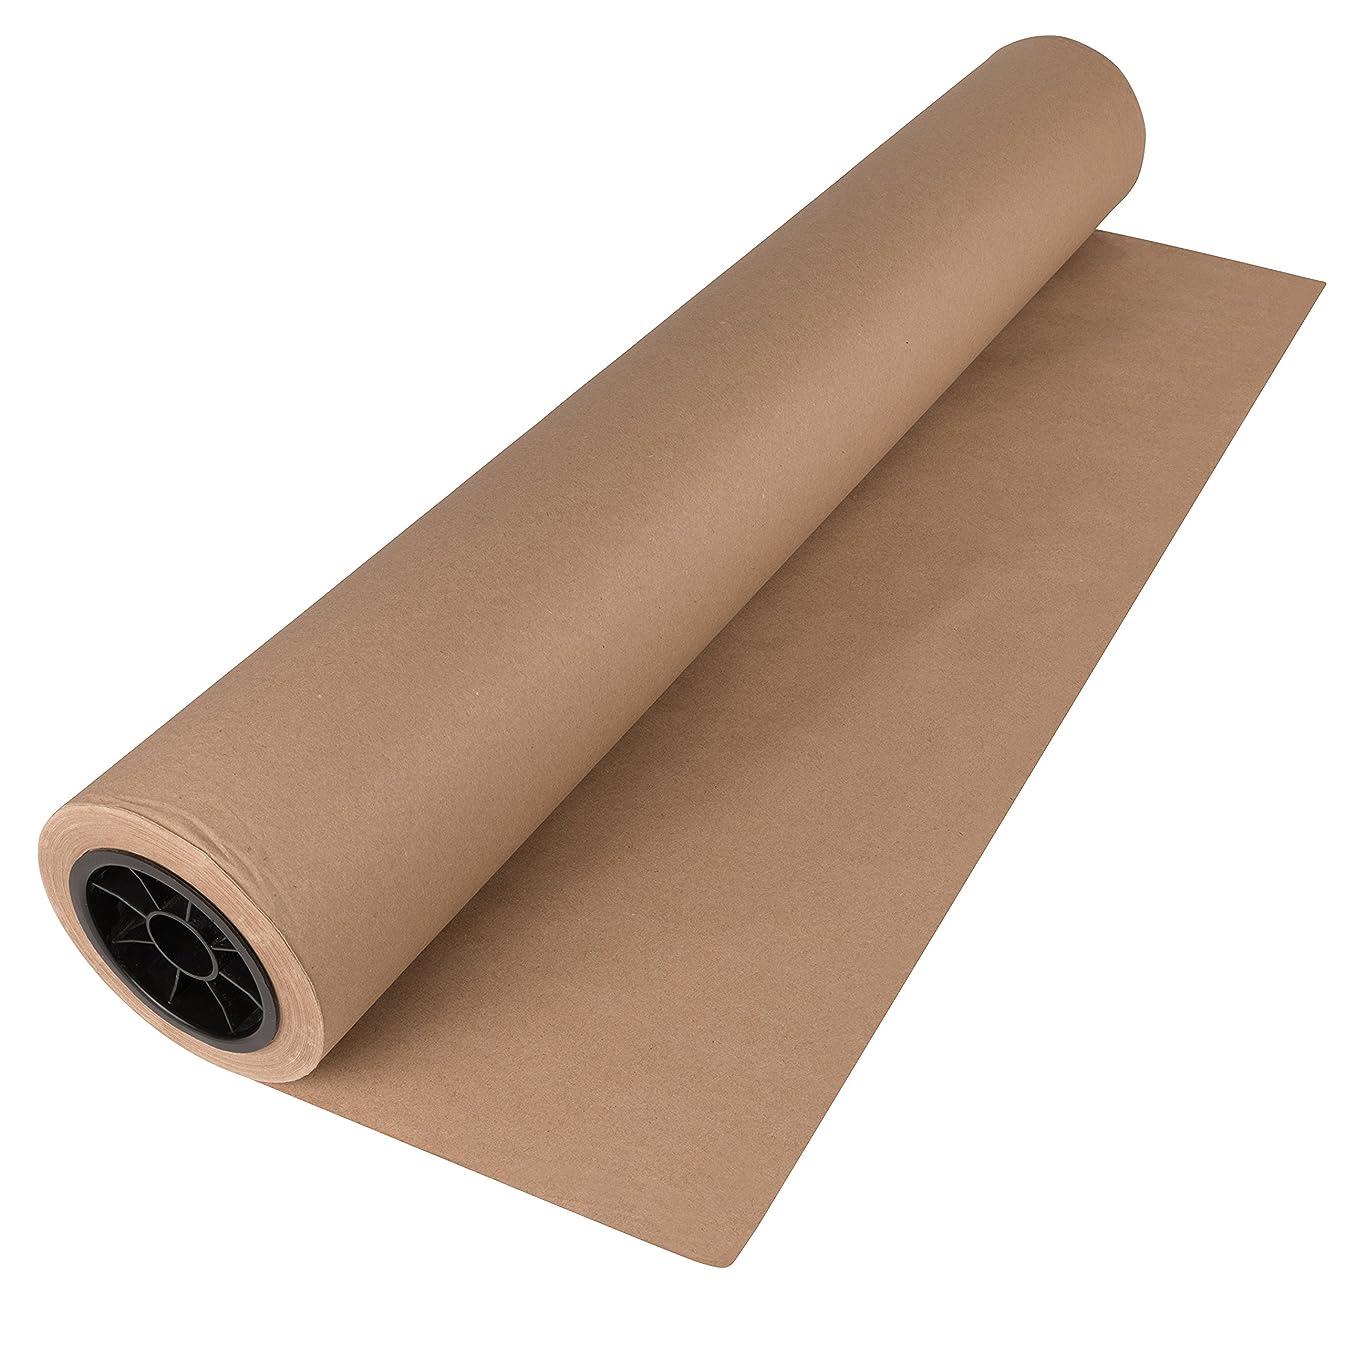 "Brown Kraft Paper Roll 30""x200 FT (2,400"